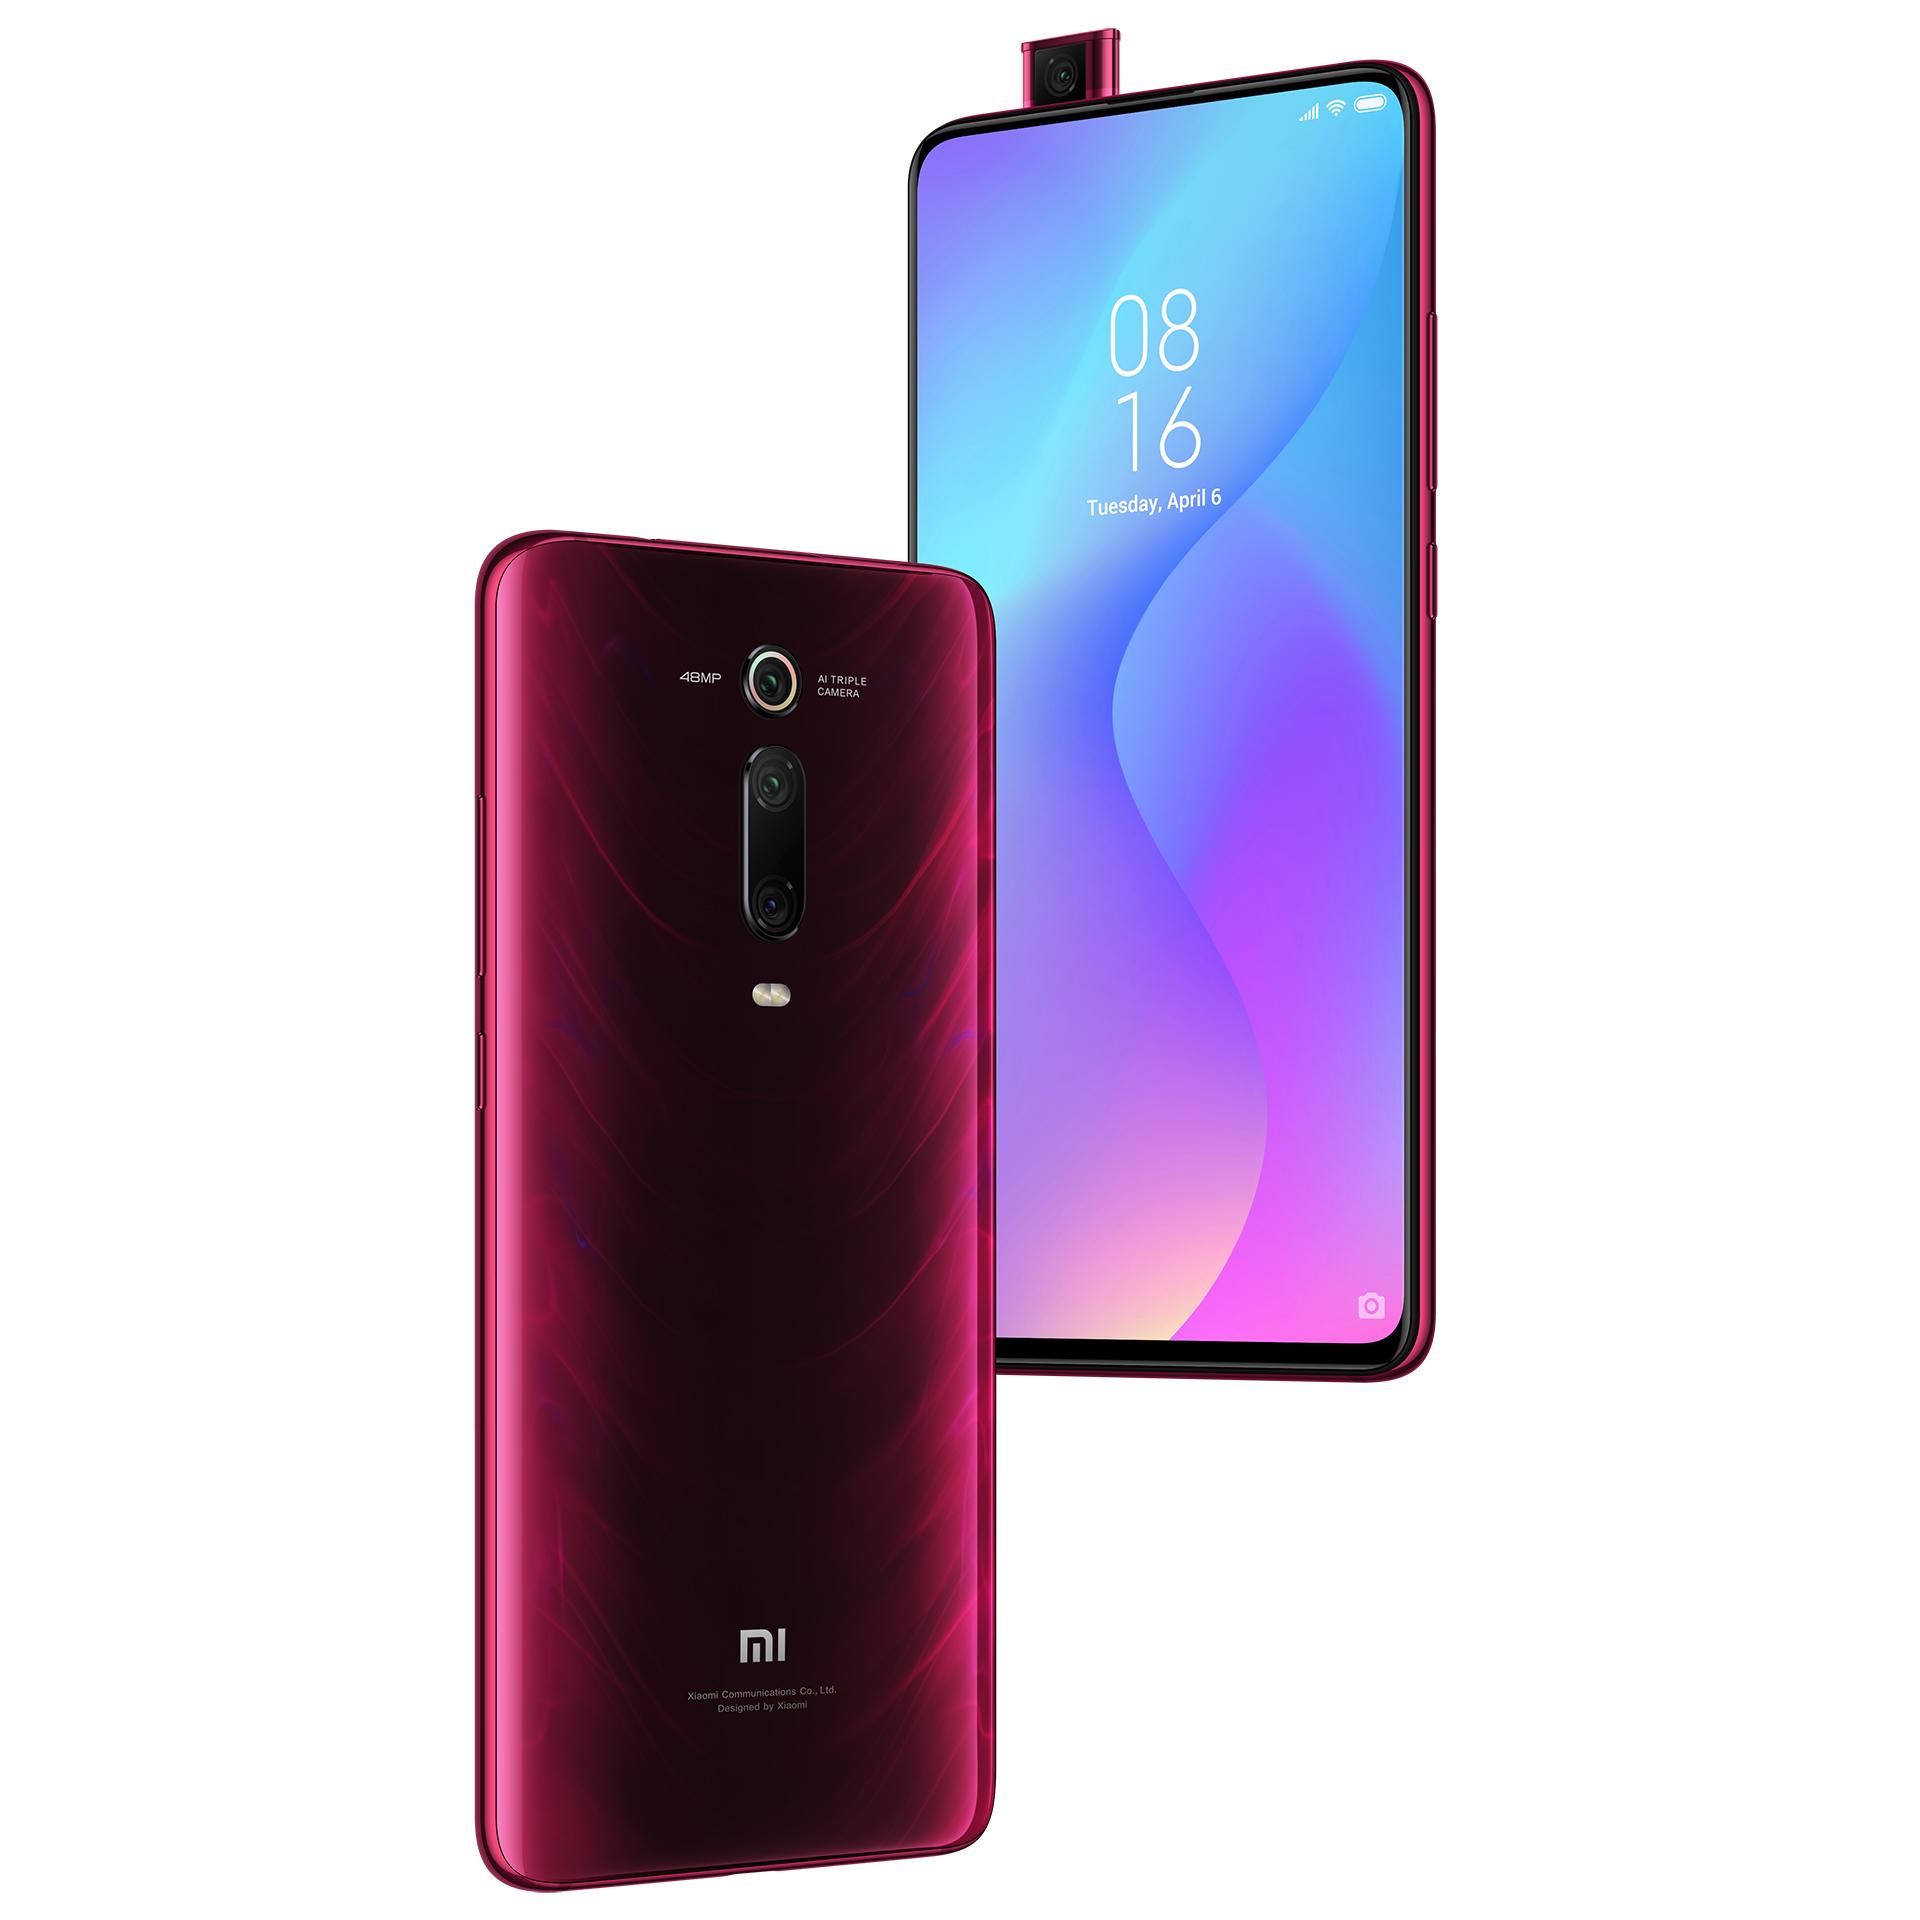 mobiiltelefon Xiaomi Mi 9T 128 GB (punane)